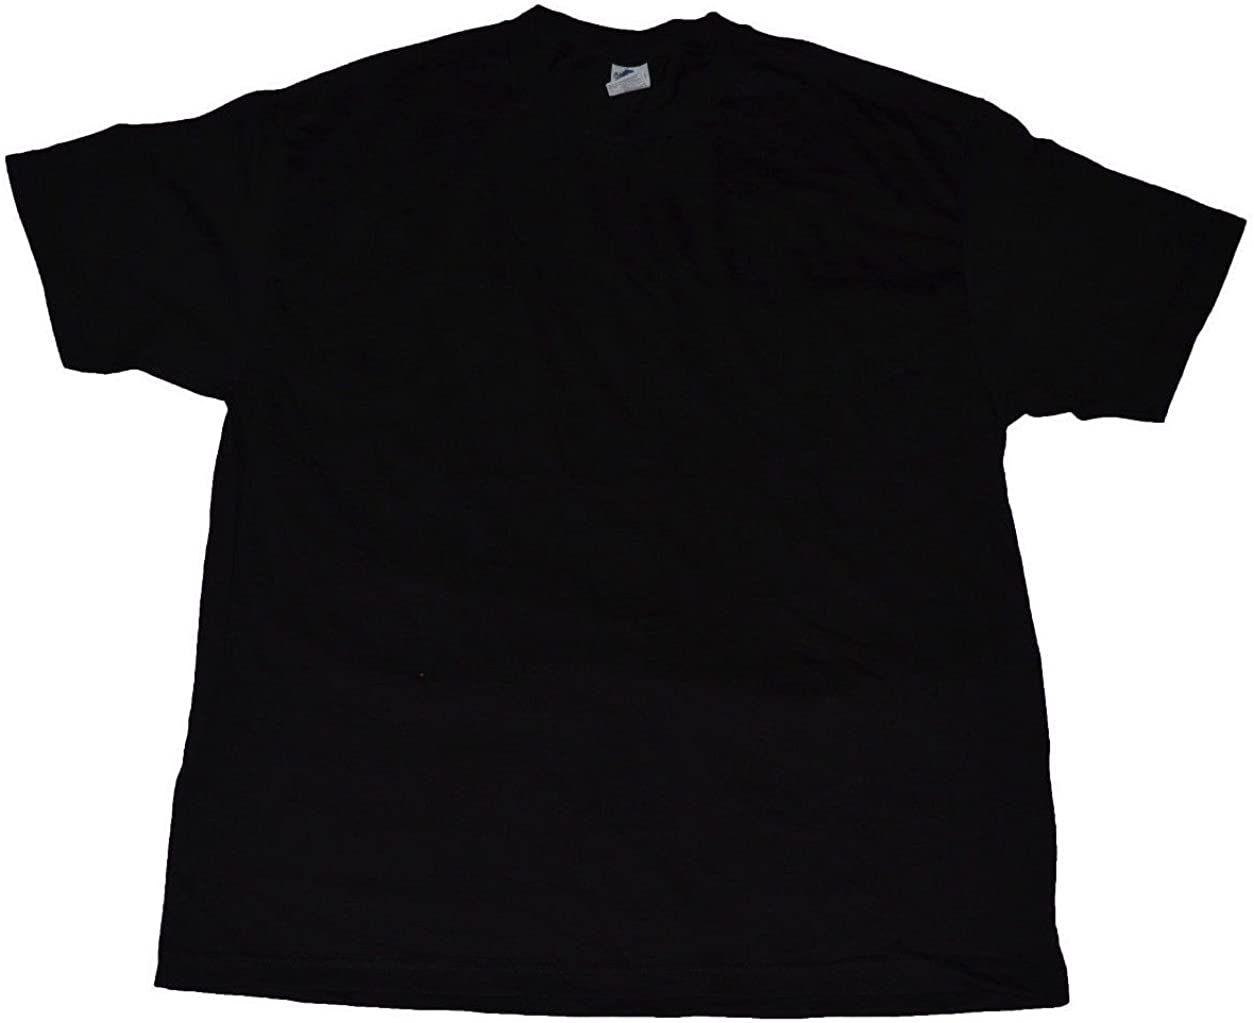 AAA Alstyle Men's Solid Plain Tshirts T Shirt Medium